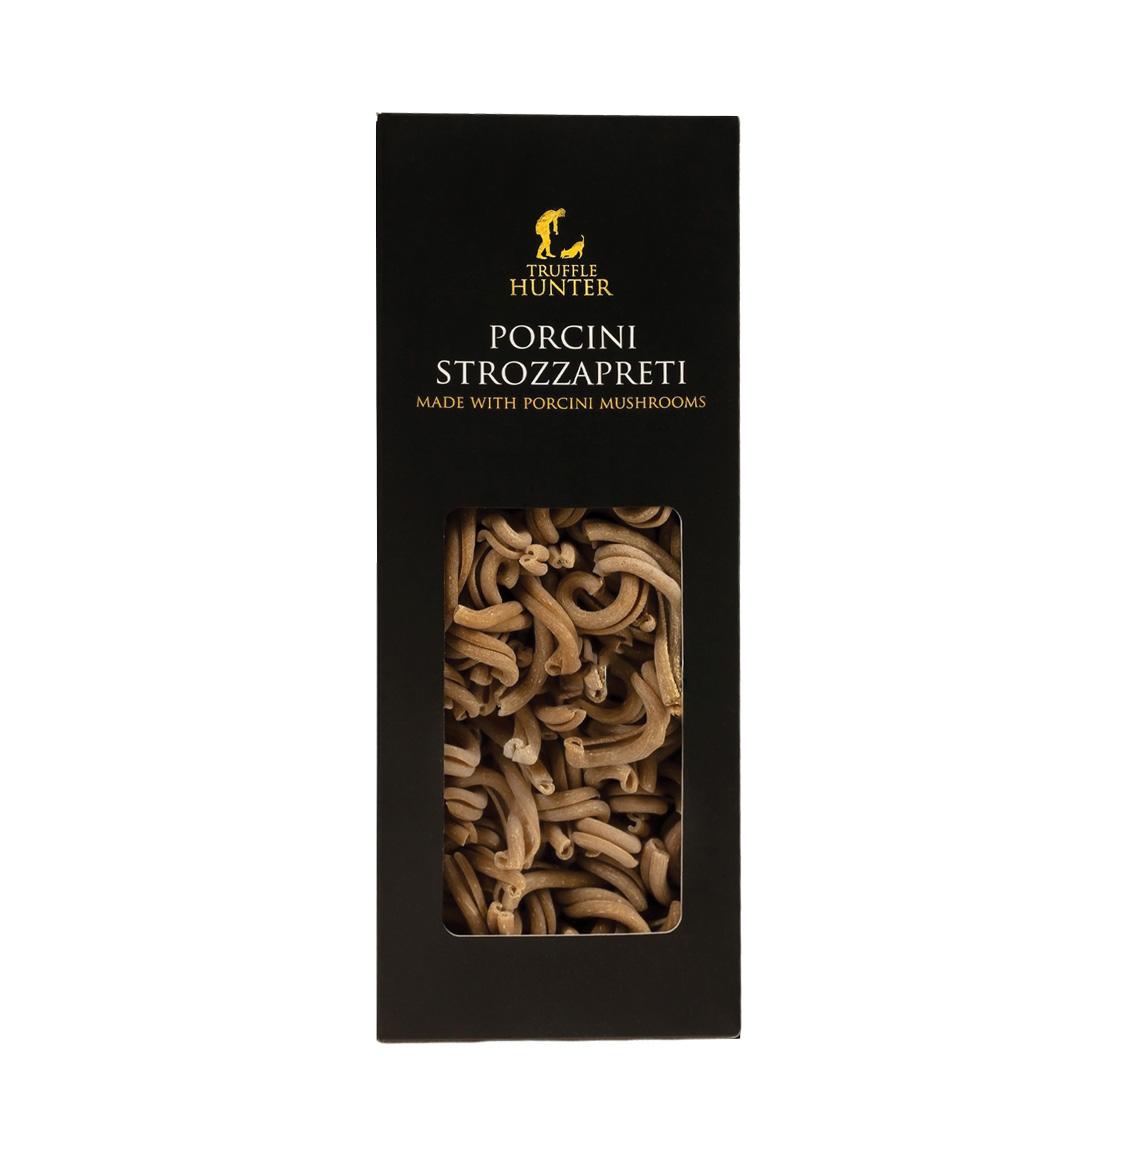 TruffleHunter Ζυμαρικά Strozzapreti Με Μανιτάρια Porcini 250g